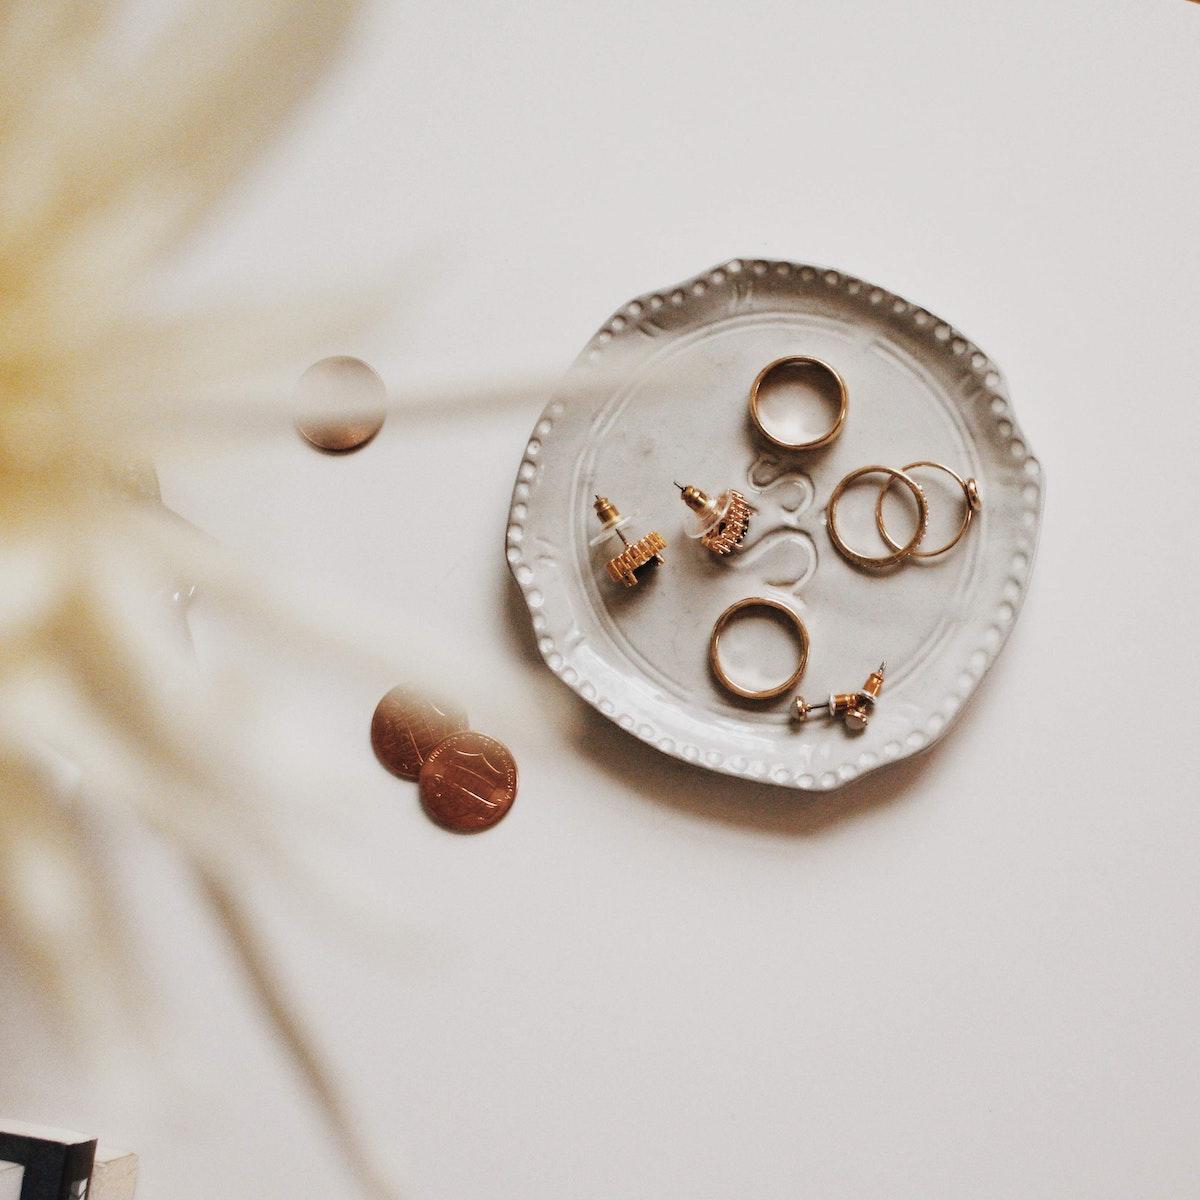 gold jewelry on a dresser